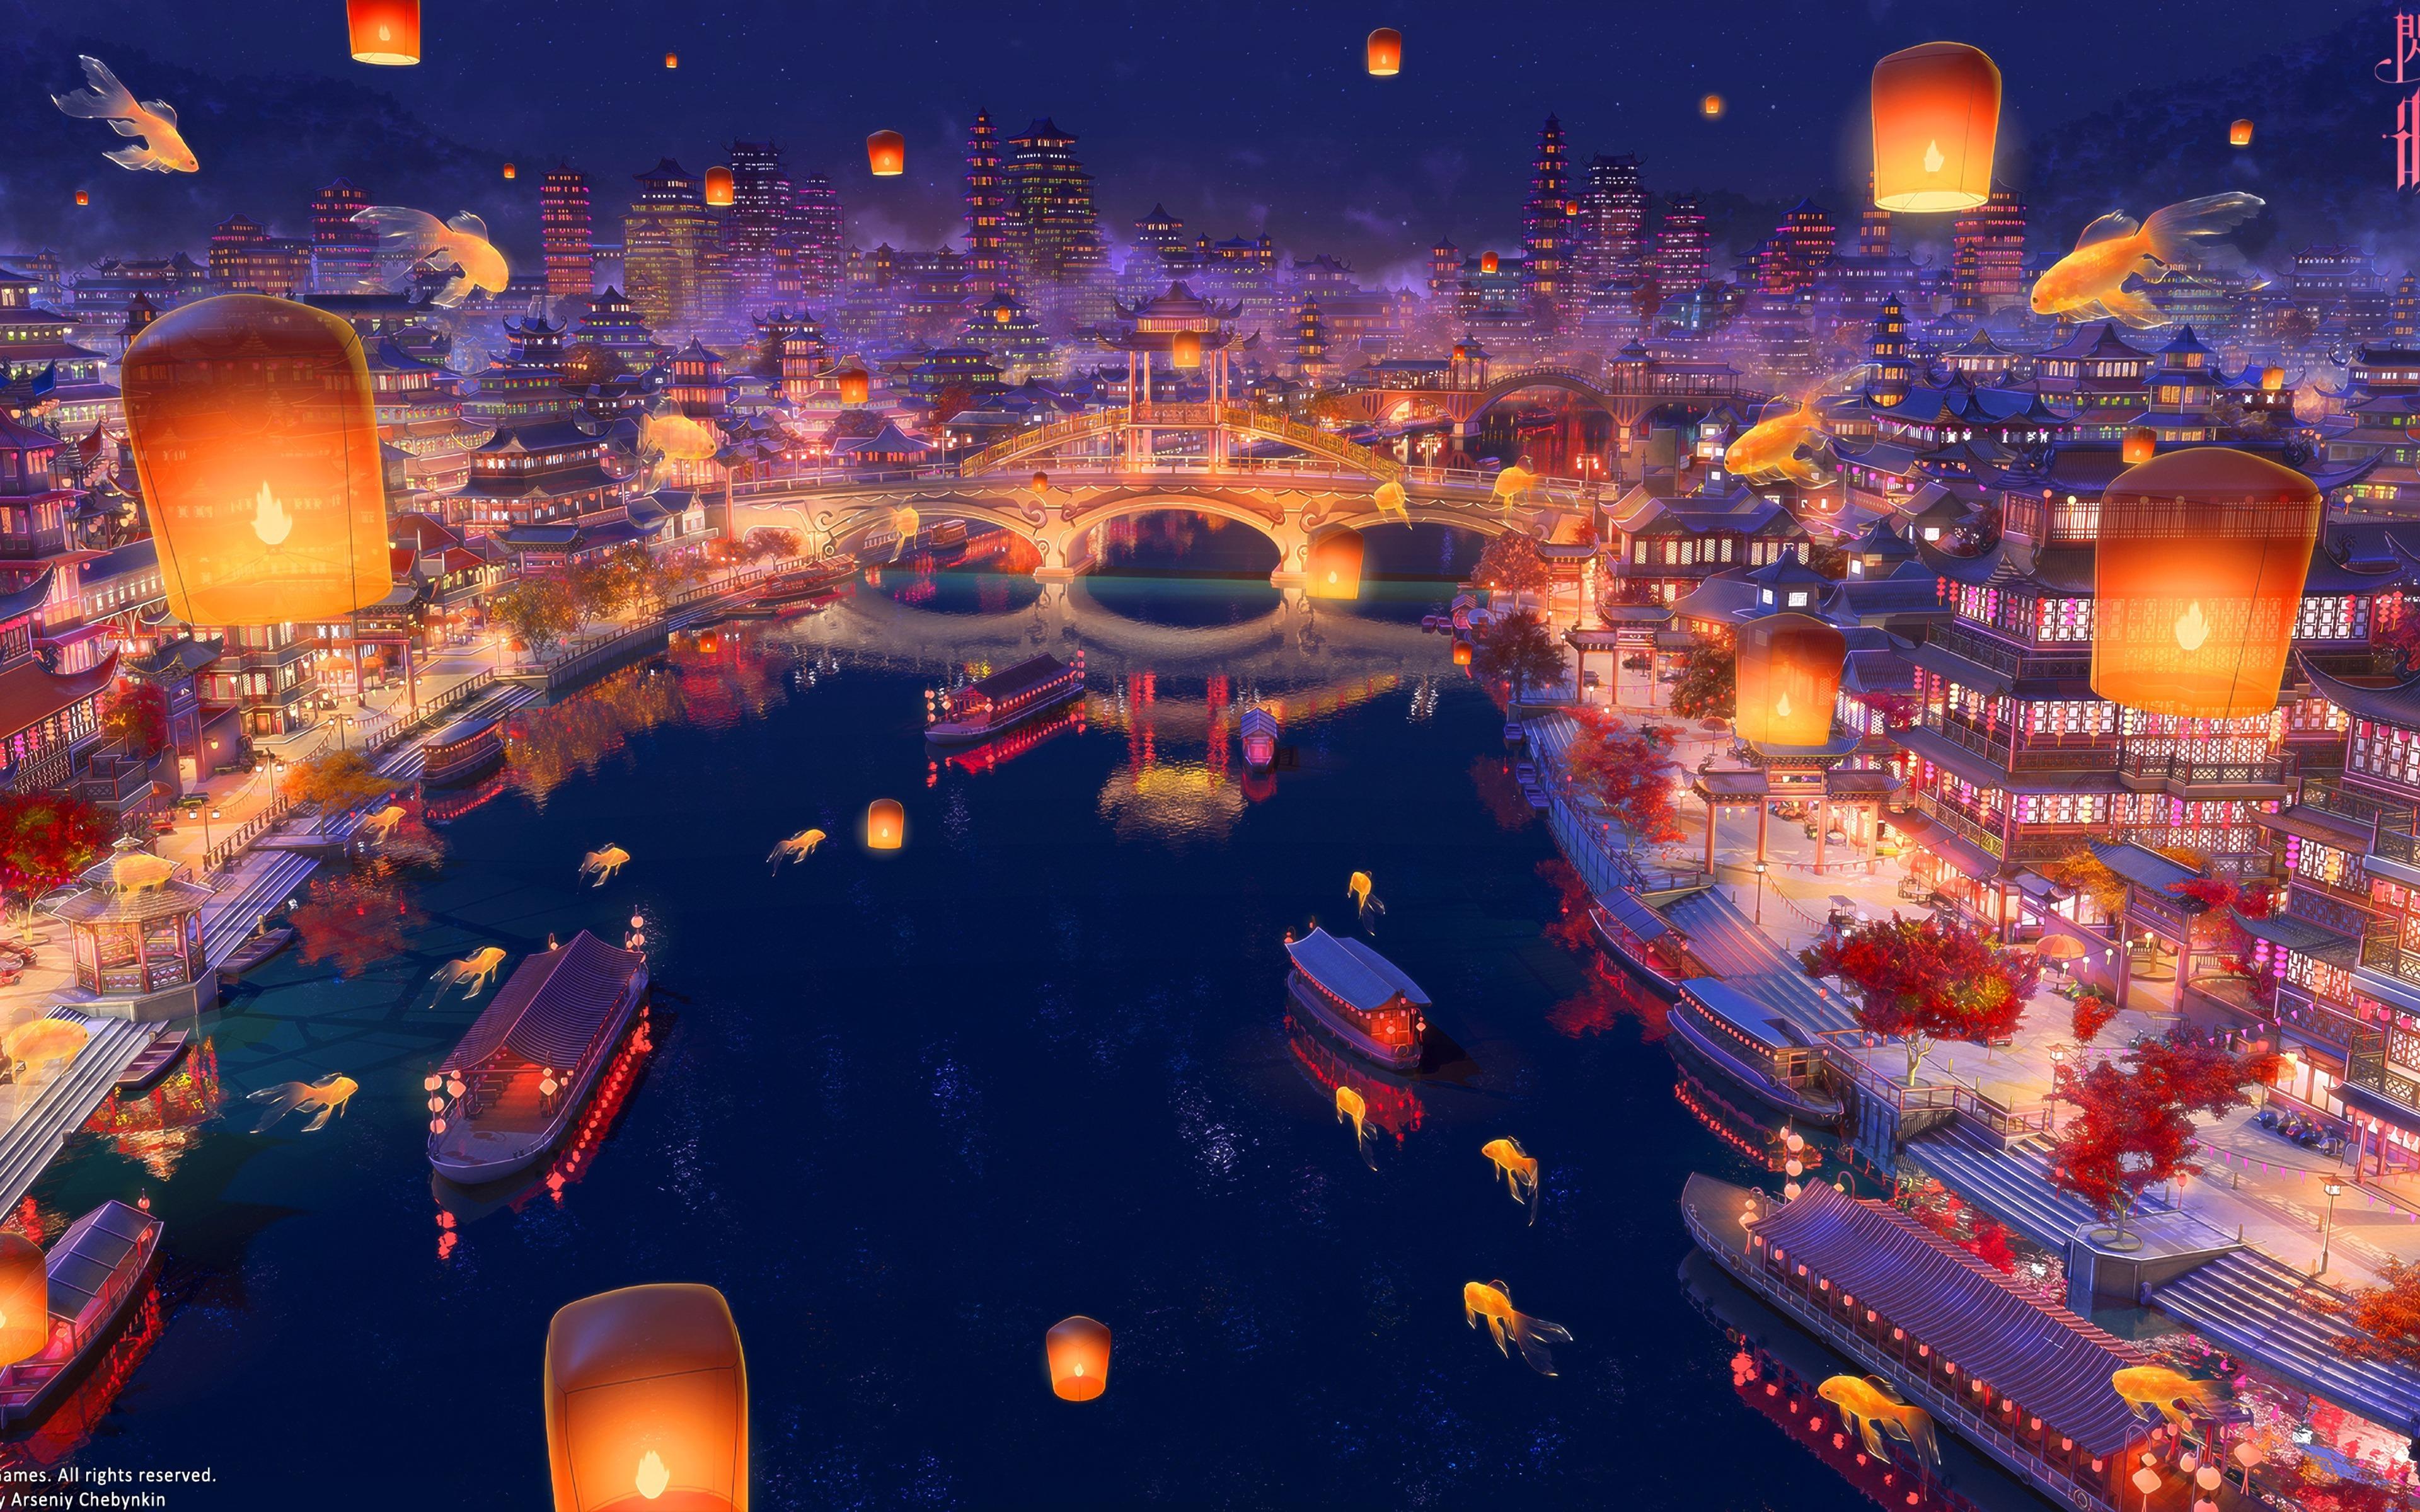 romantic-city-4k-jn.jpg